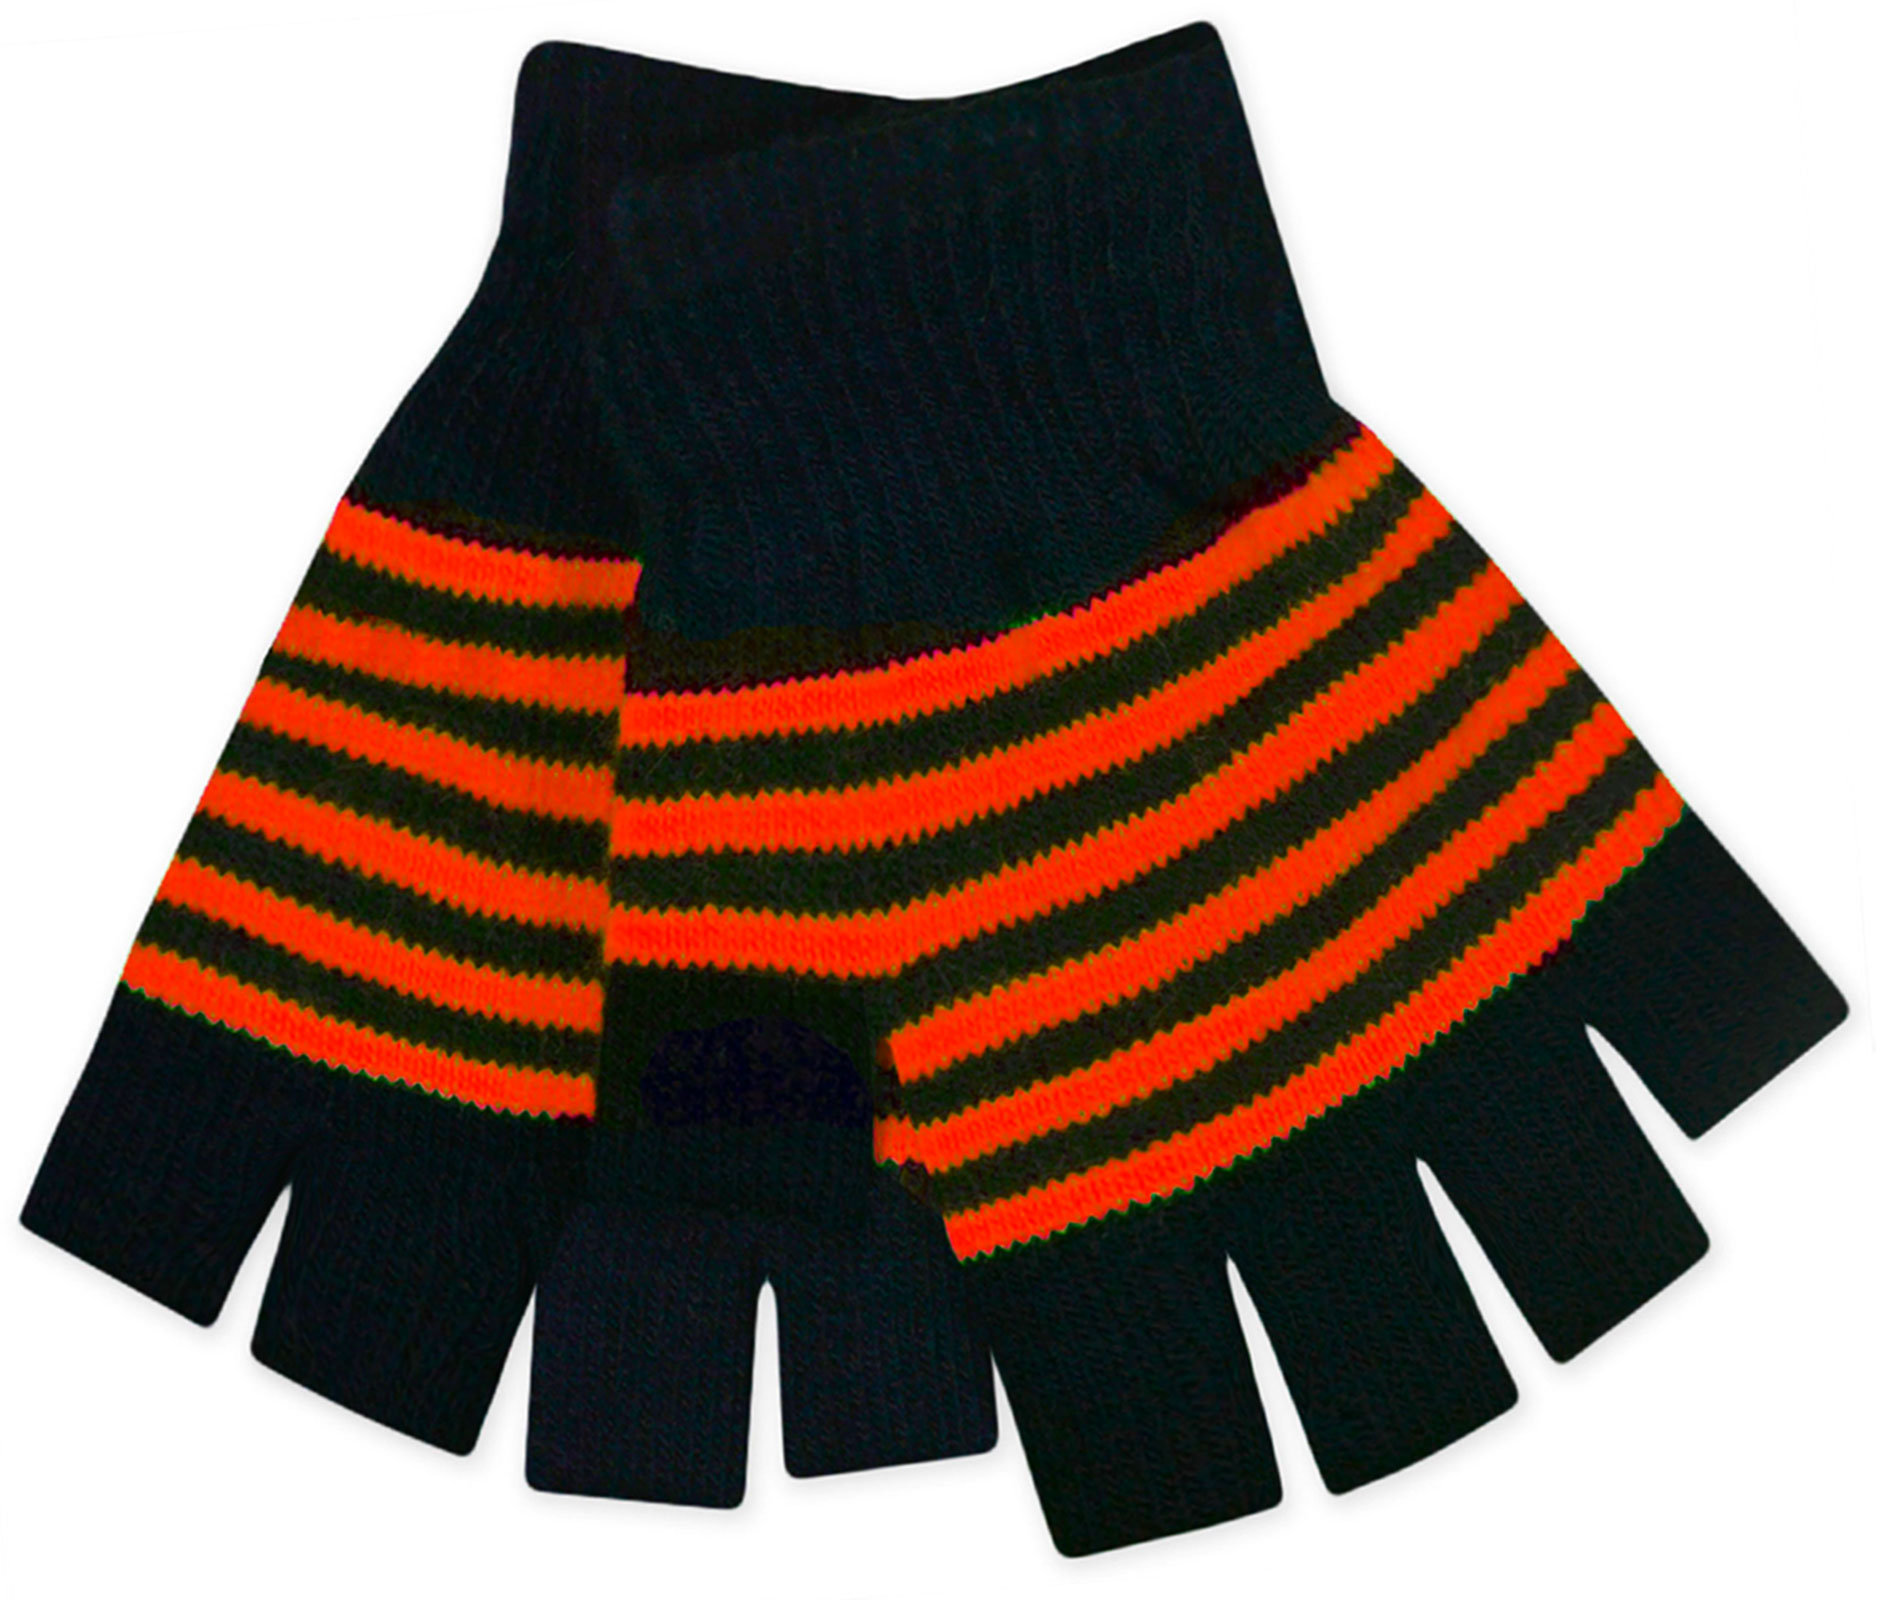 JollyRascals Kids 2 in 1 Magic Gloves Neon Stripe Boys Girls New Stretchy Winter 2 Pieces Set